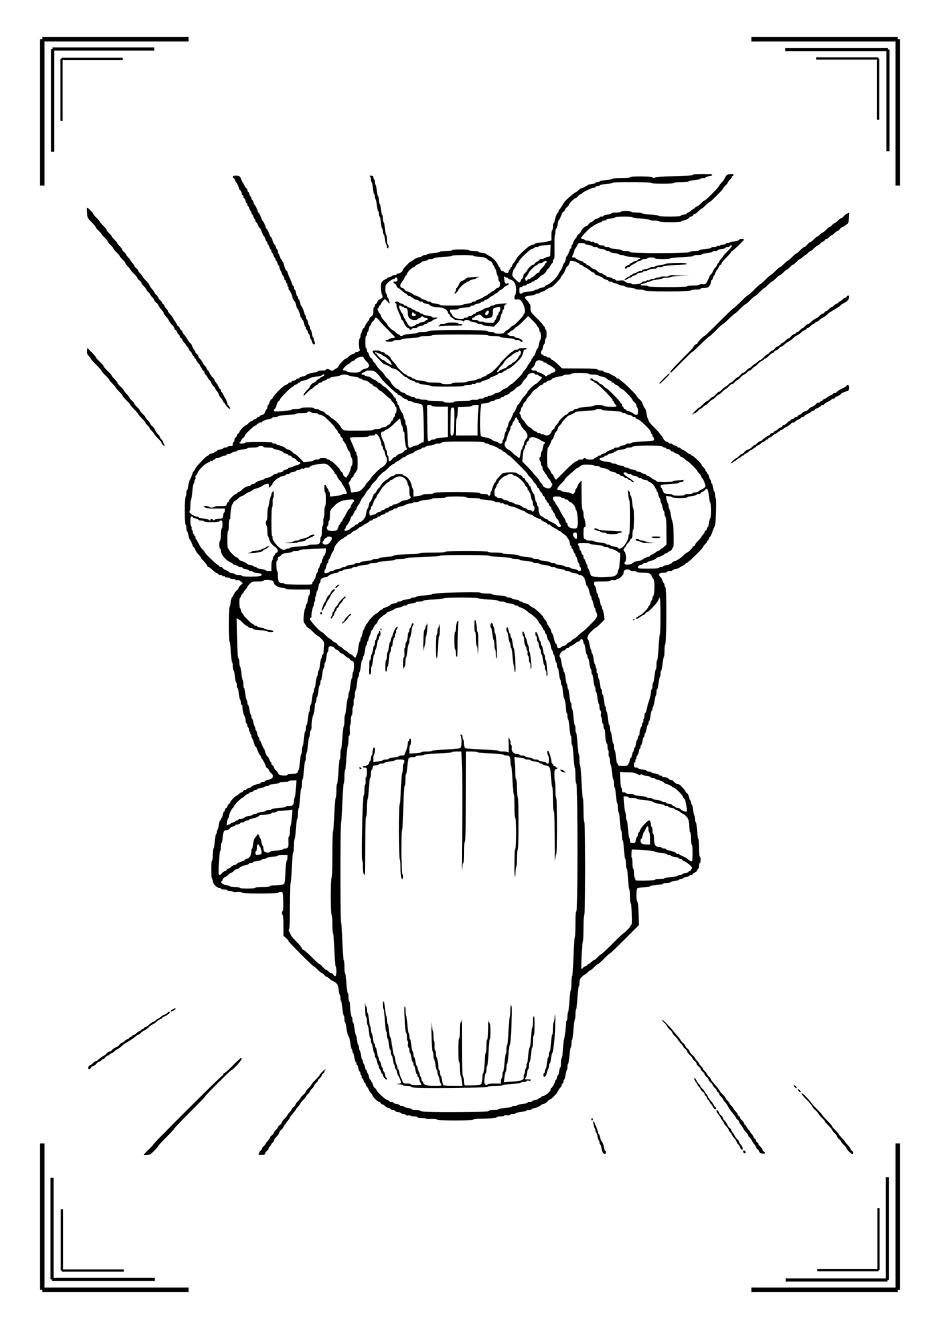 Раскраска: черепашка ниндзя на мотоцикле — raskraski-a4.ru